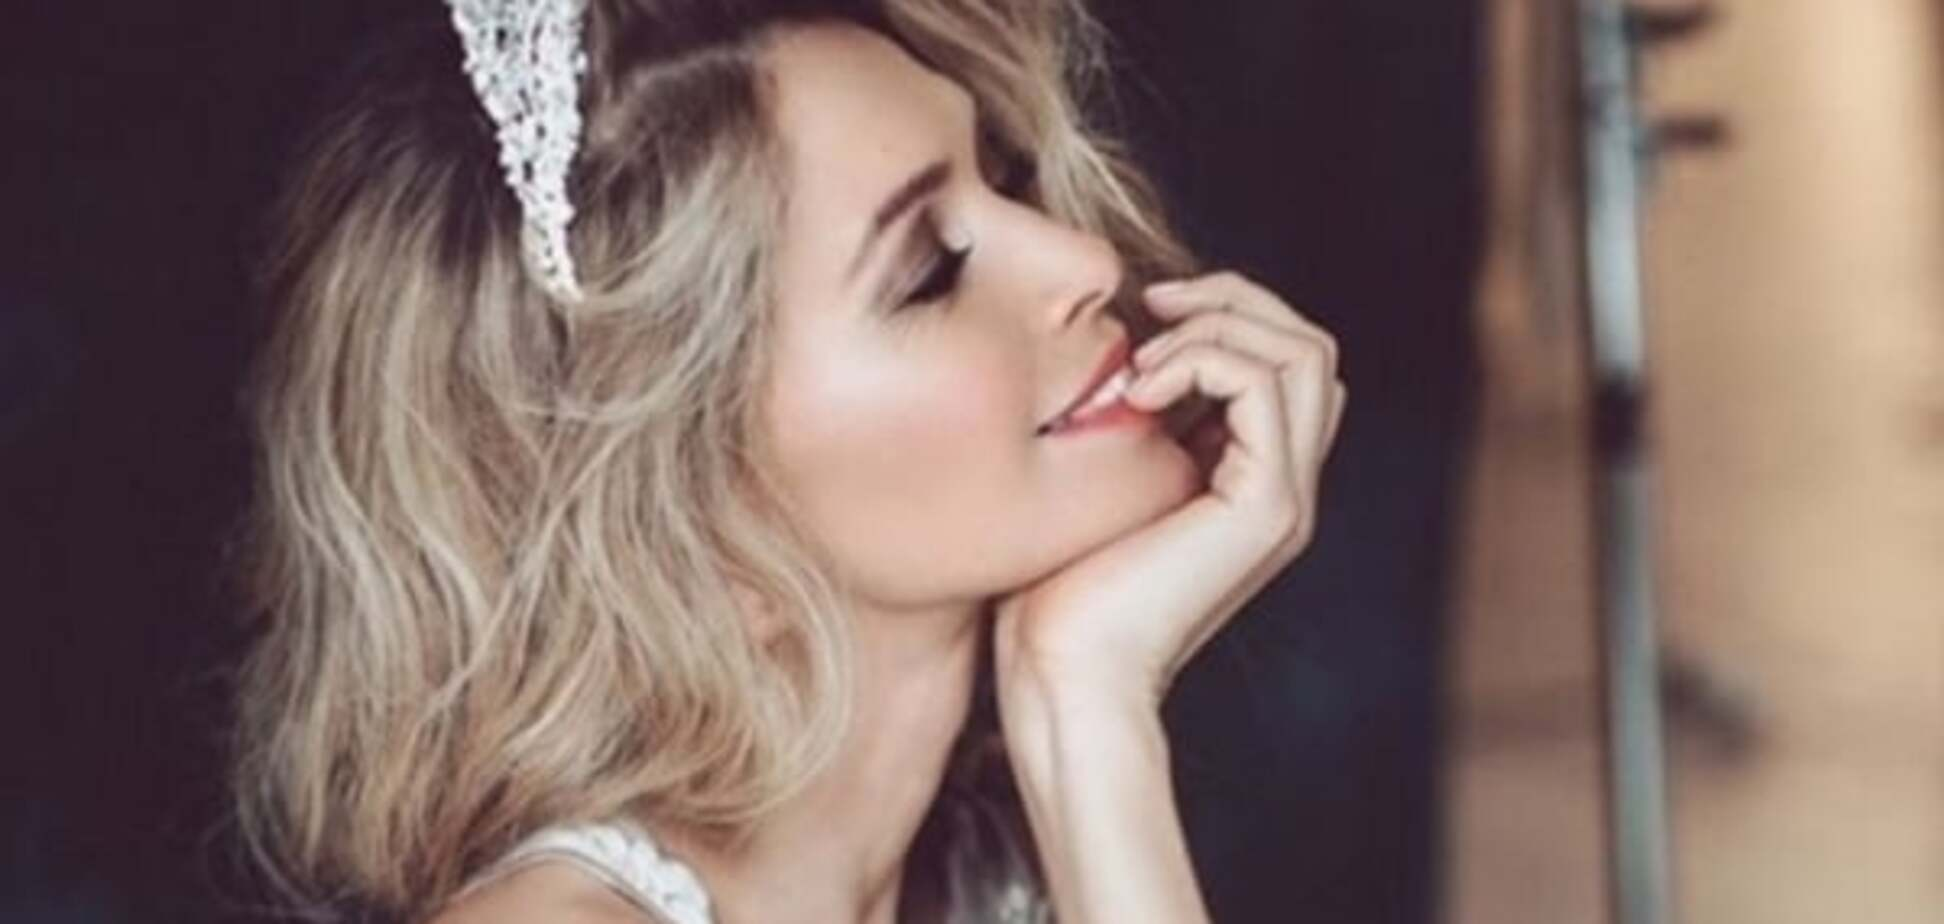 Брежнєва своїм фото натякнула на щасливе подружнє життя з Меладзе